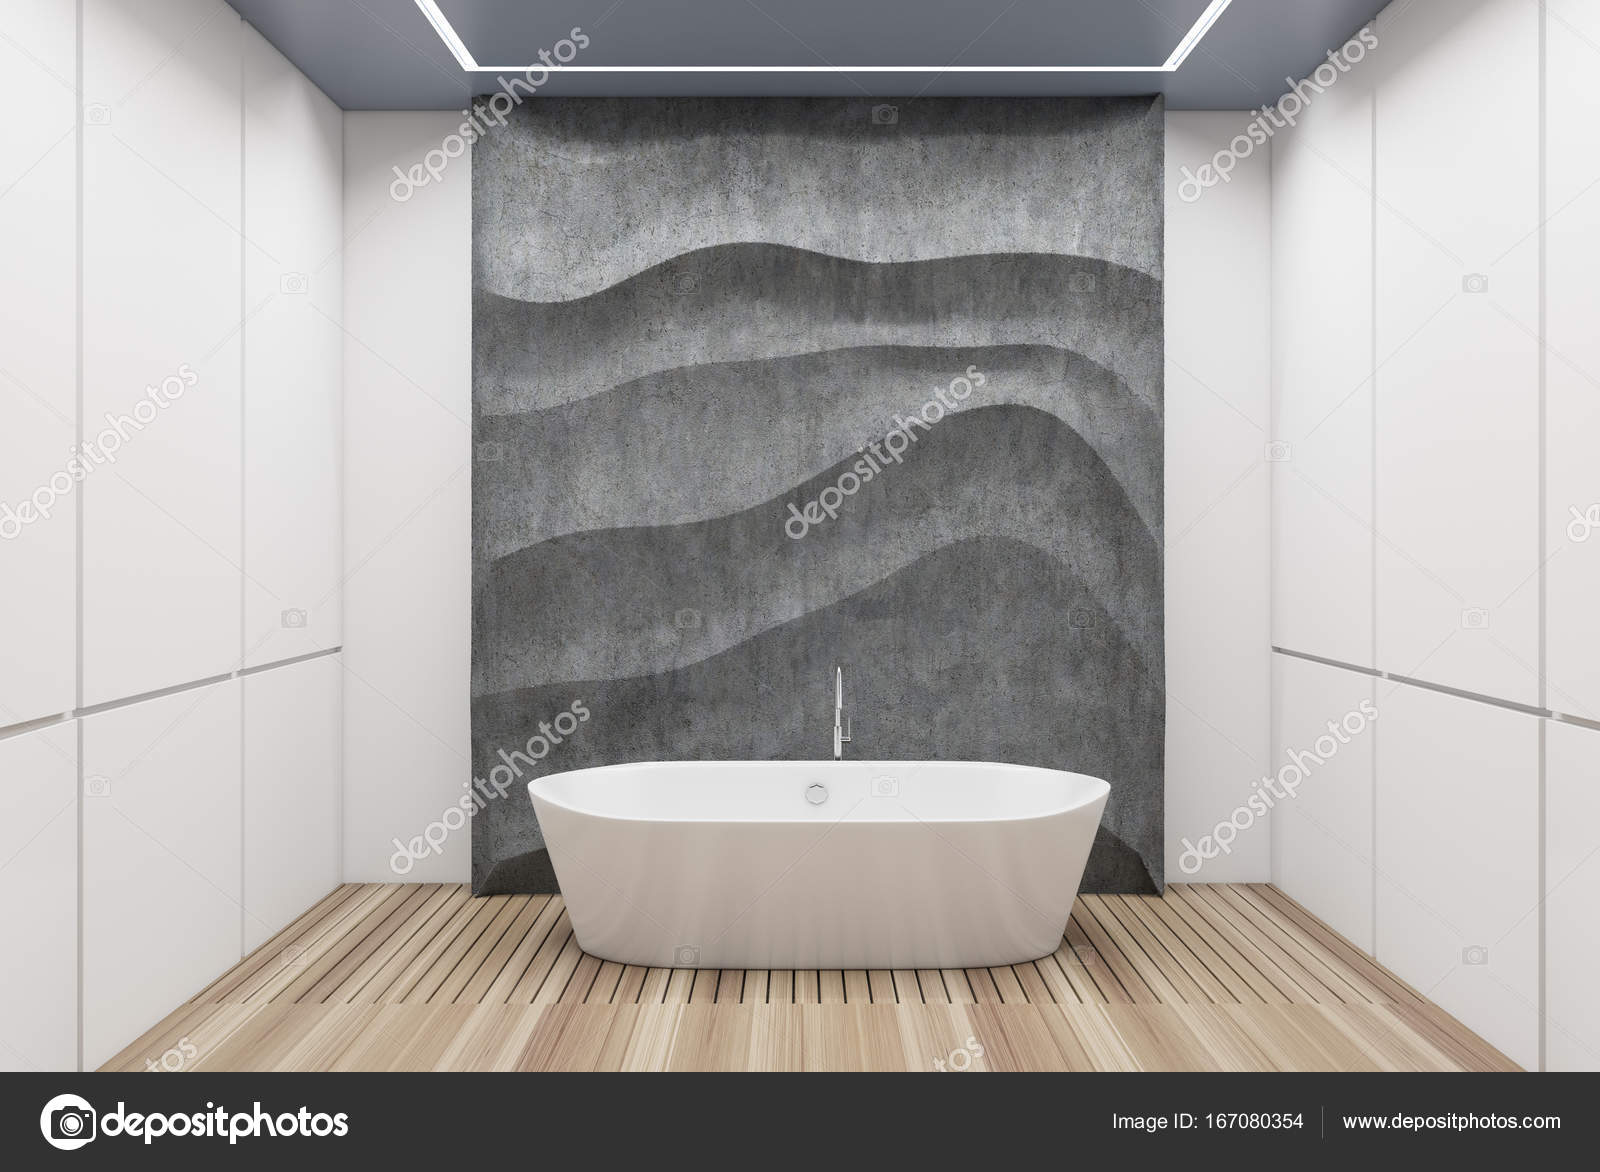 Vasca da bagno bianco e cemento bianco u2014 foto stock